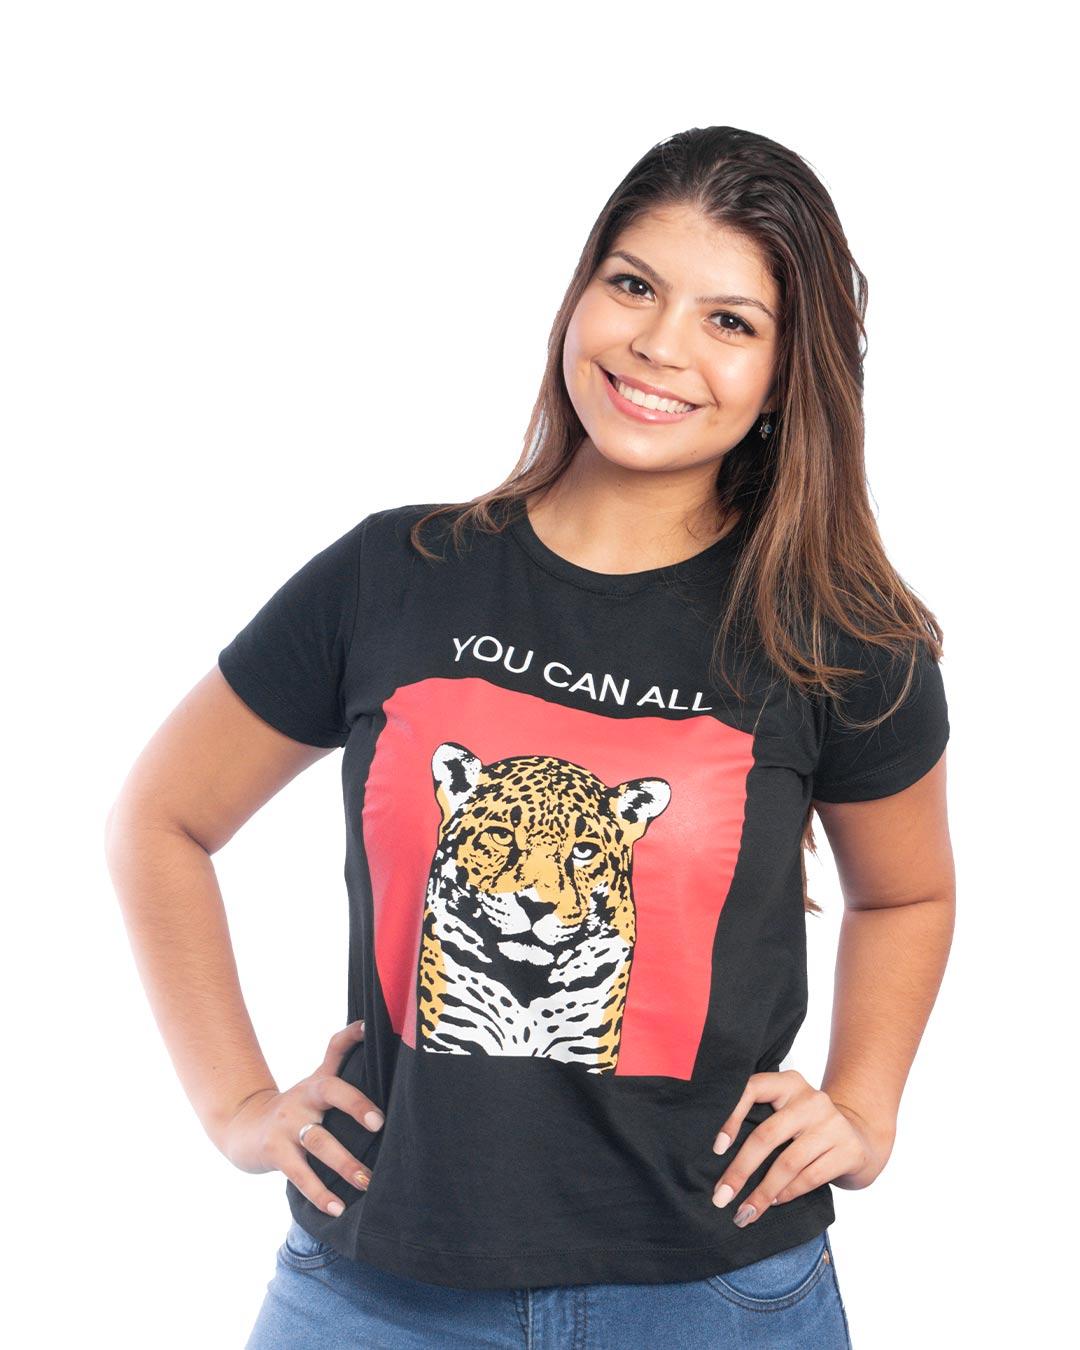 T-Shirt Adulta e Plus Size You Can All - Santa Margô